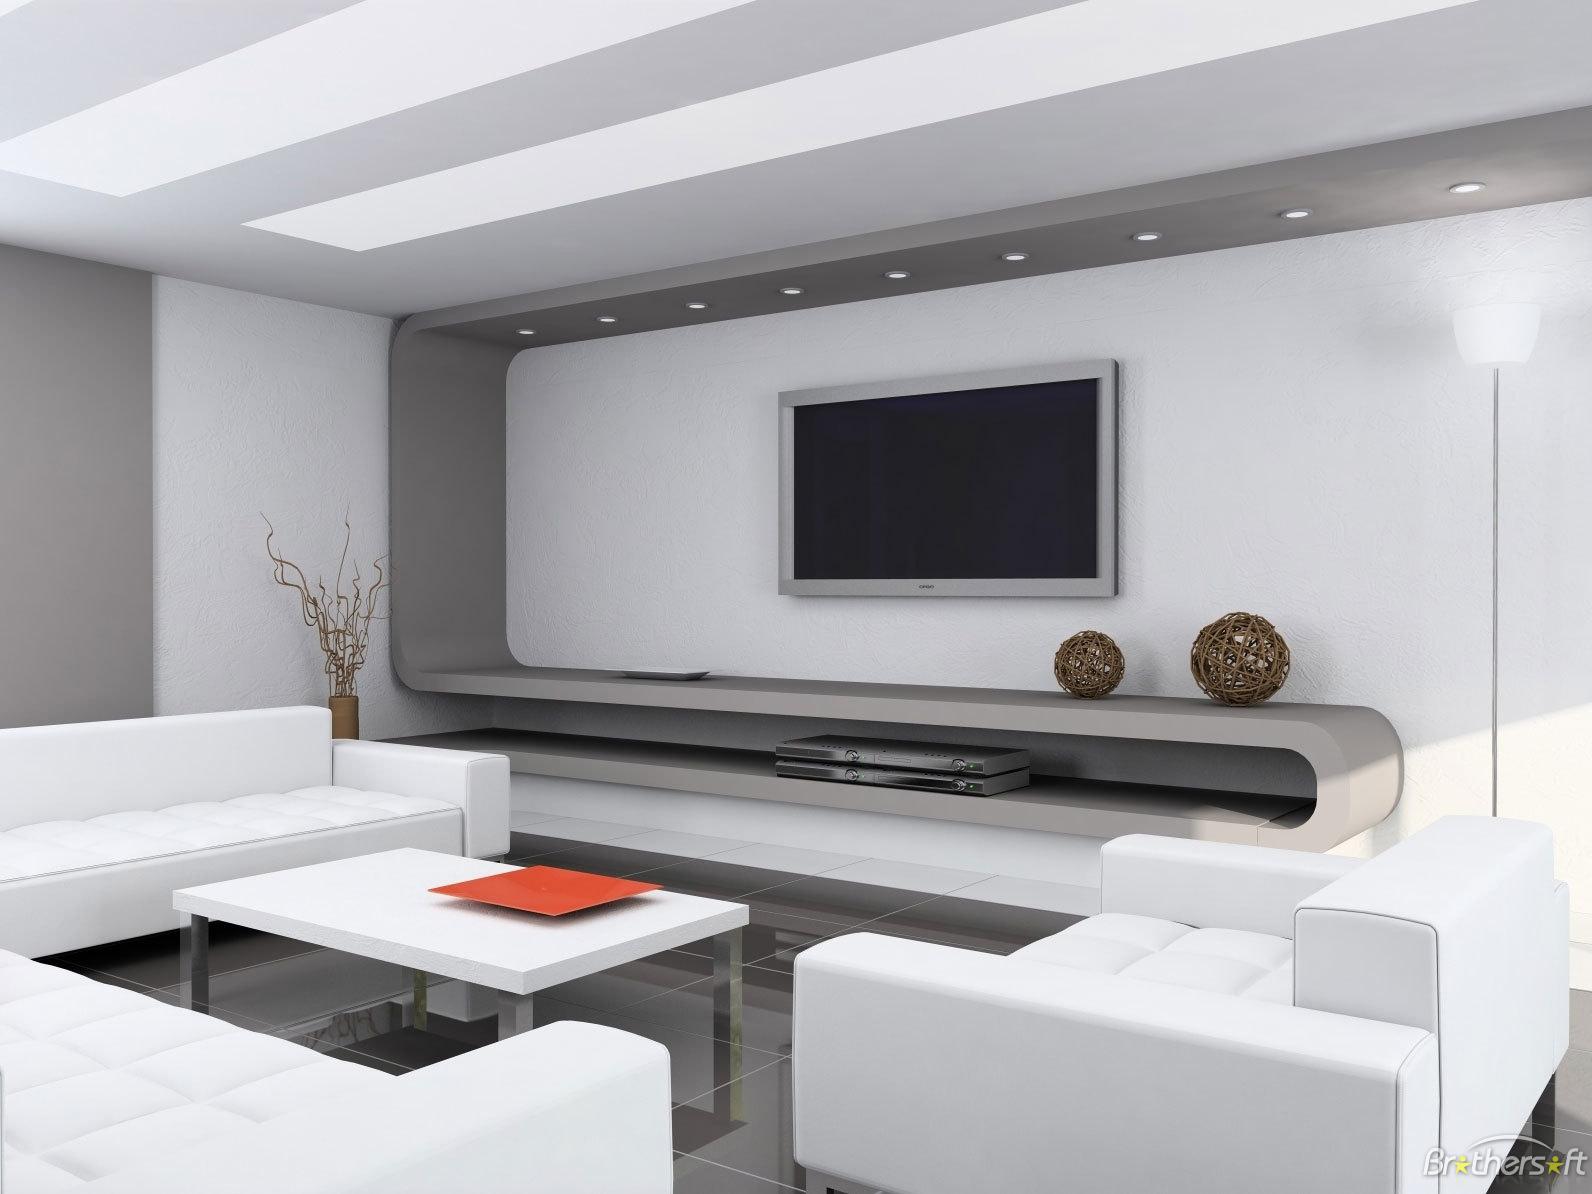 interior design ideas home interior decorating. Black Bedroom Furniture Sets. Home Design Ideas